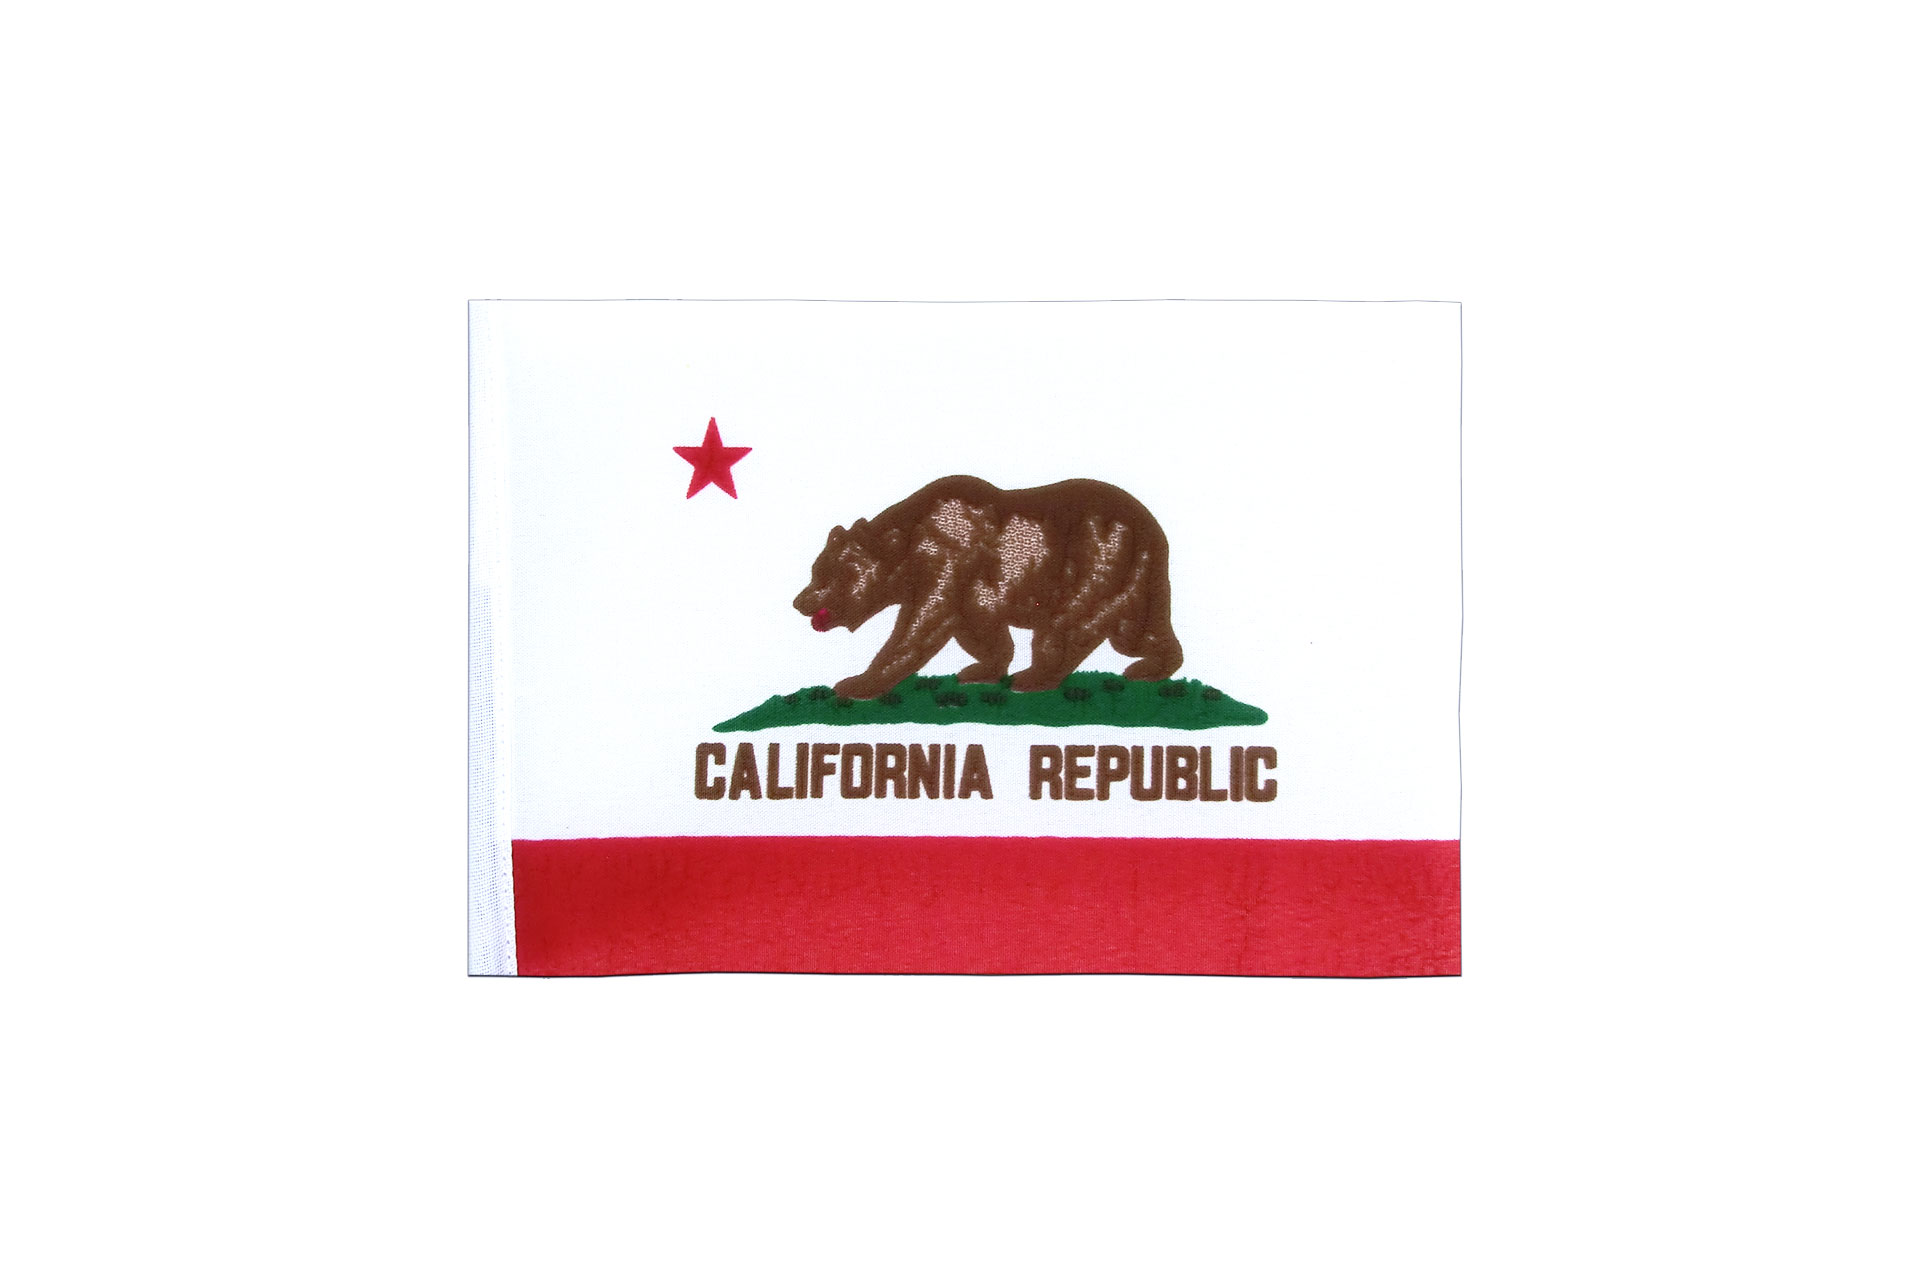 40c04a343aa93 California - Mini Flag 4x6